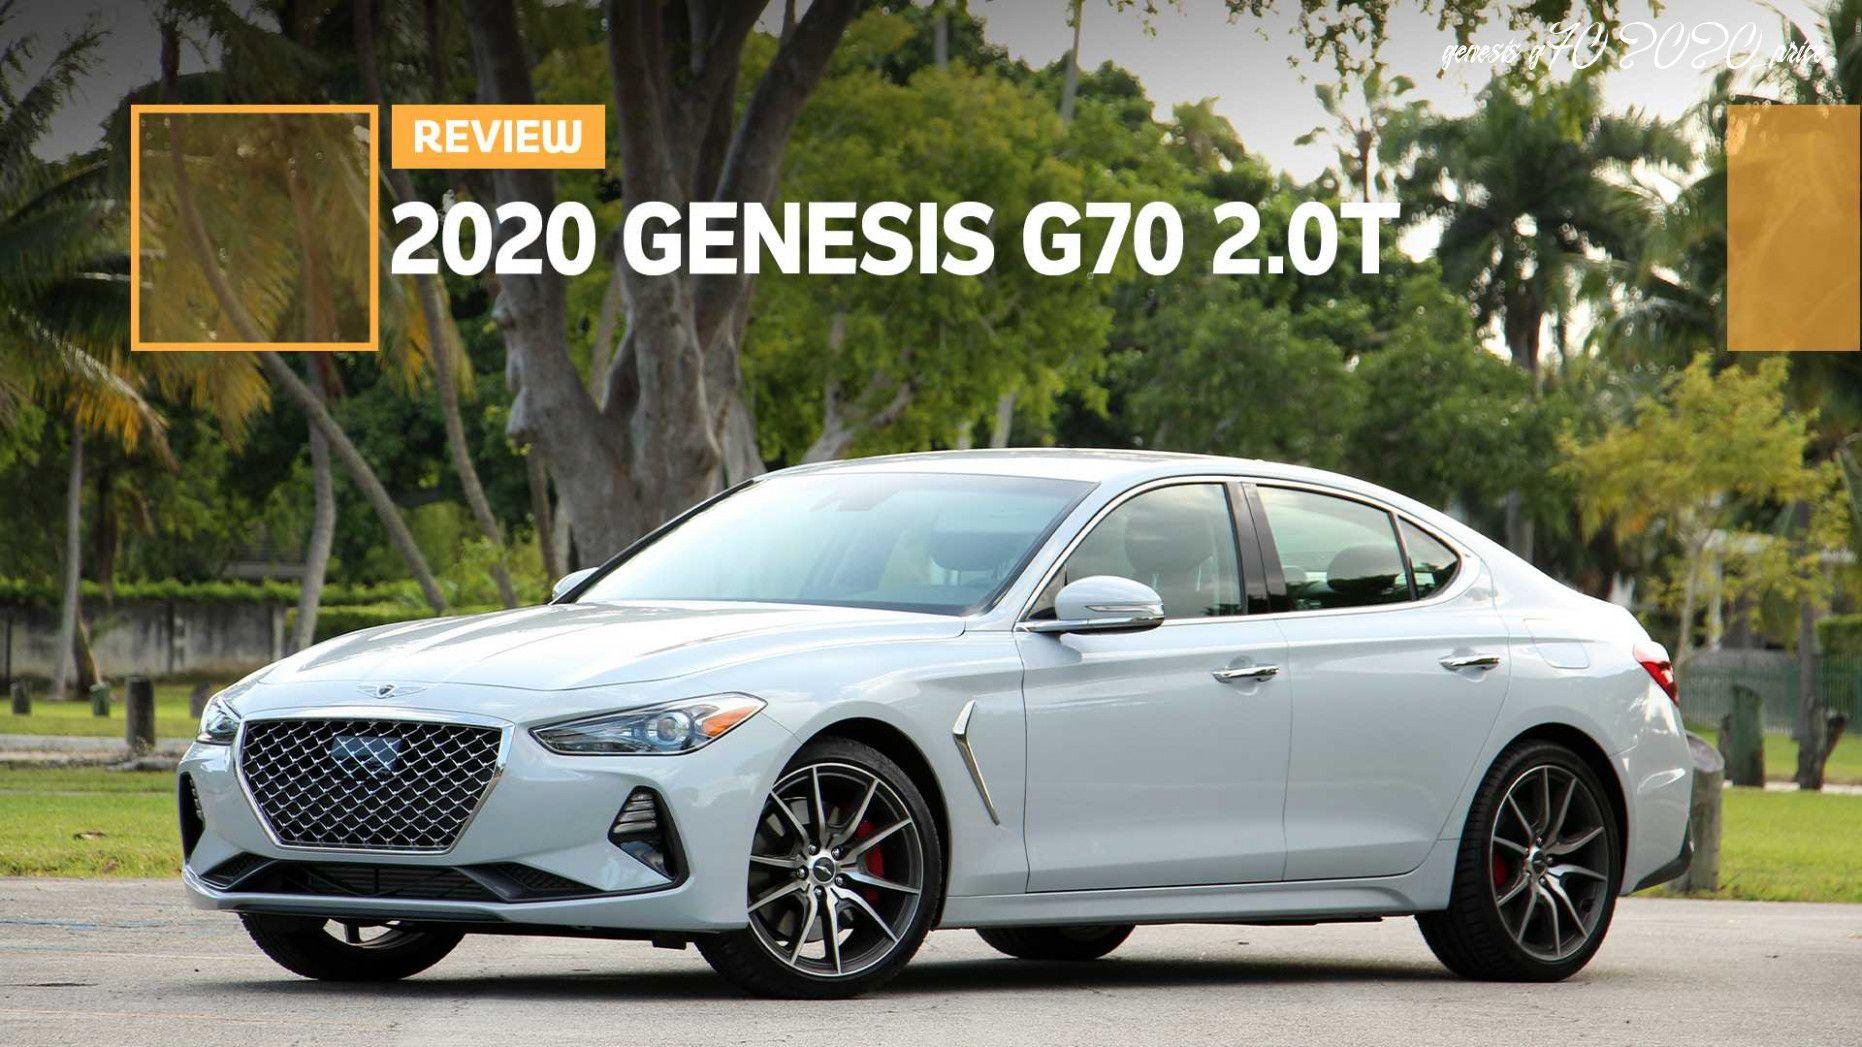 Genesis G70 2020 Price Picture In 2020 Kia Car Sports Cars